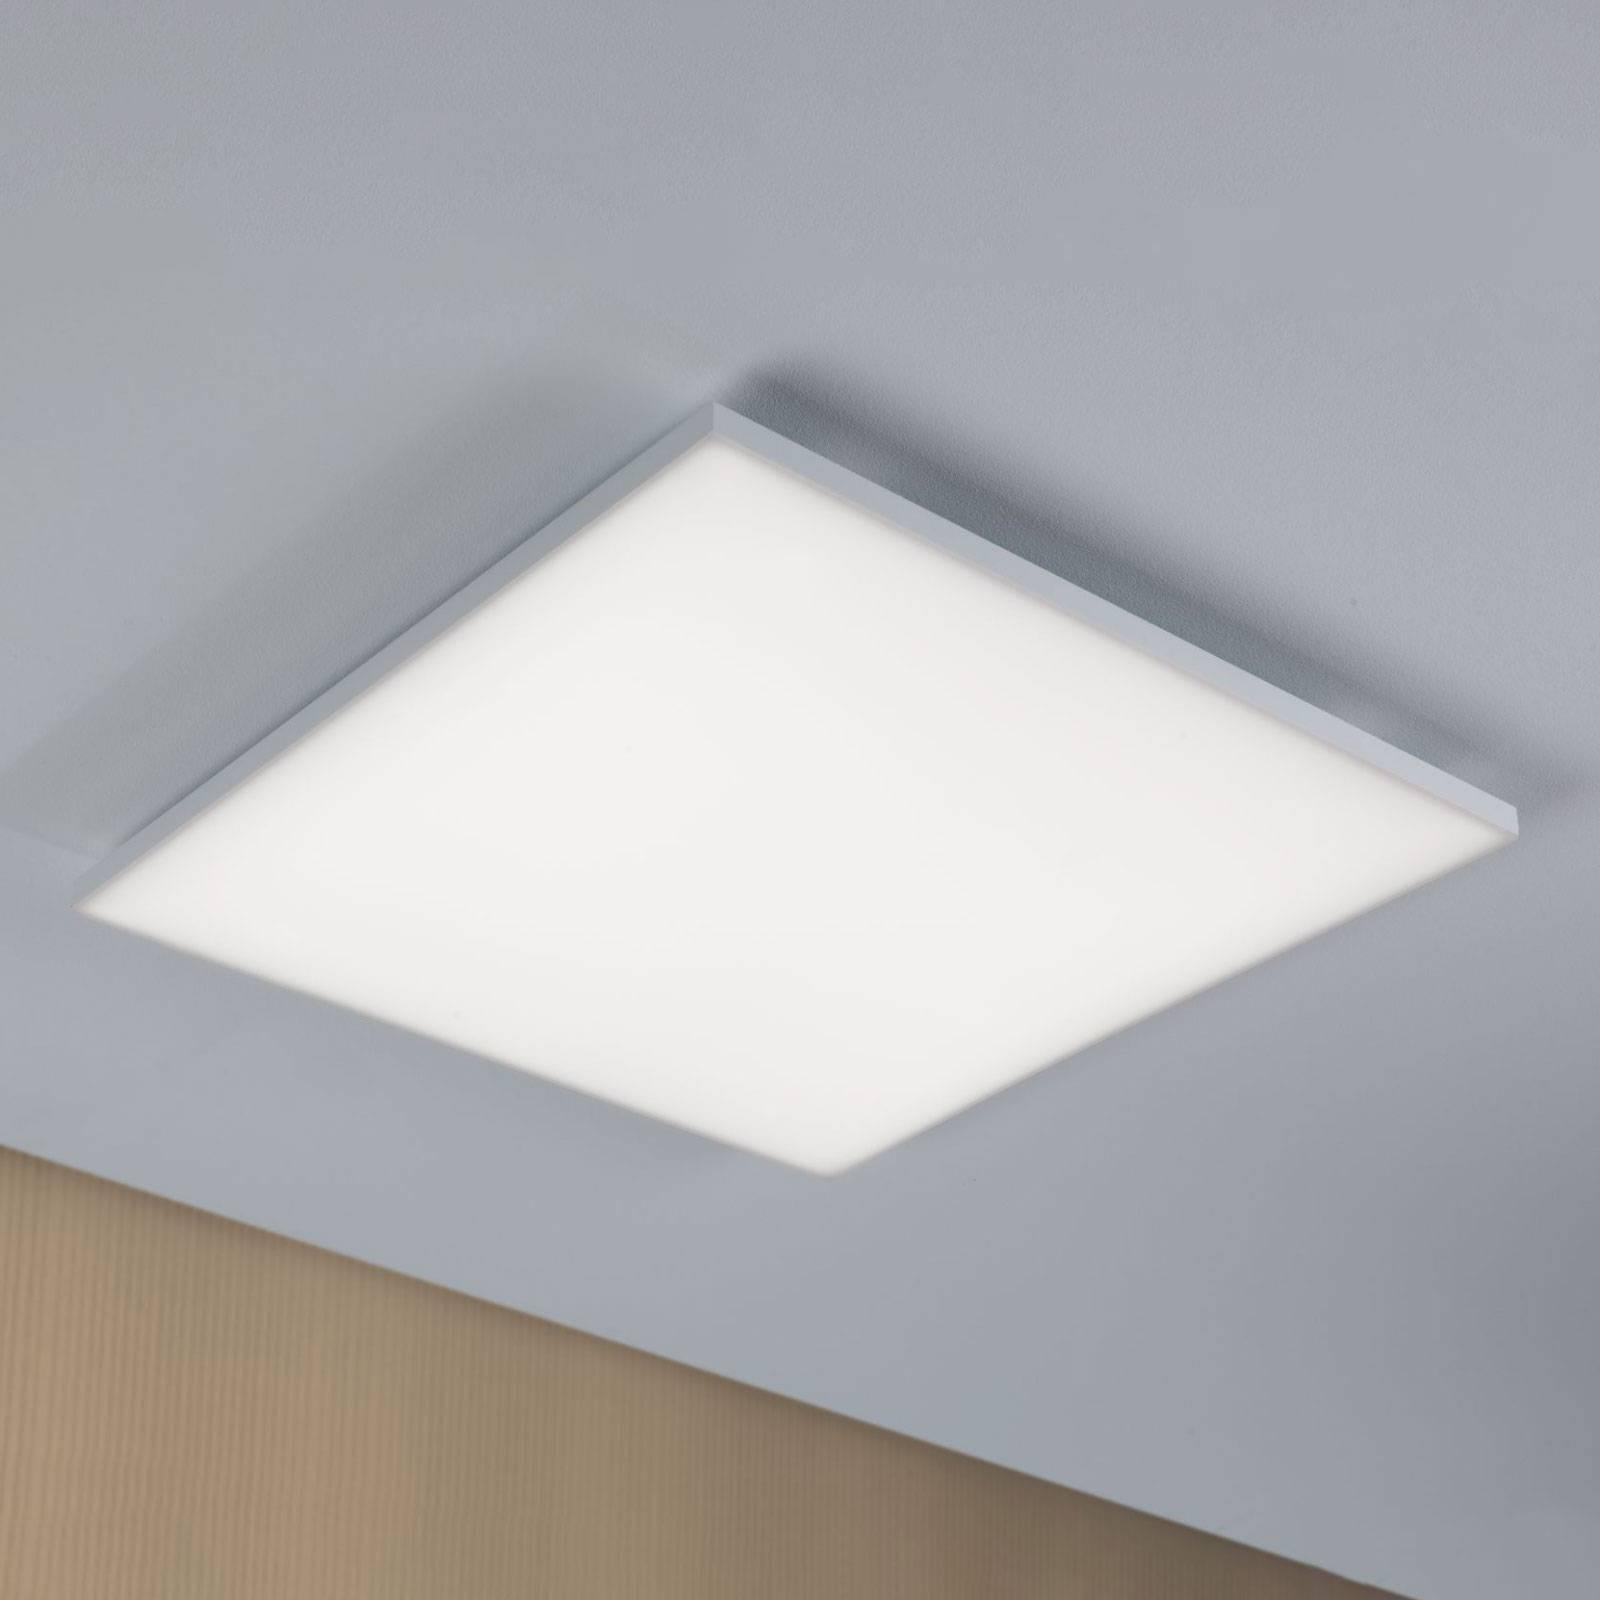 Paulmann Velora LED-Deckenleuchte 59,5 x 59,5cm